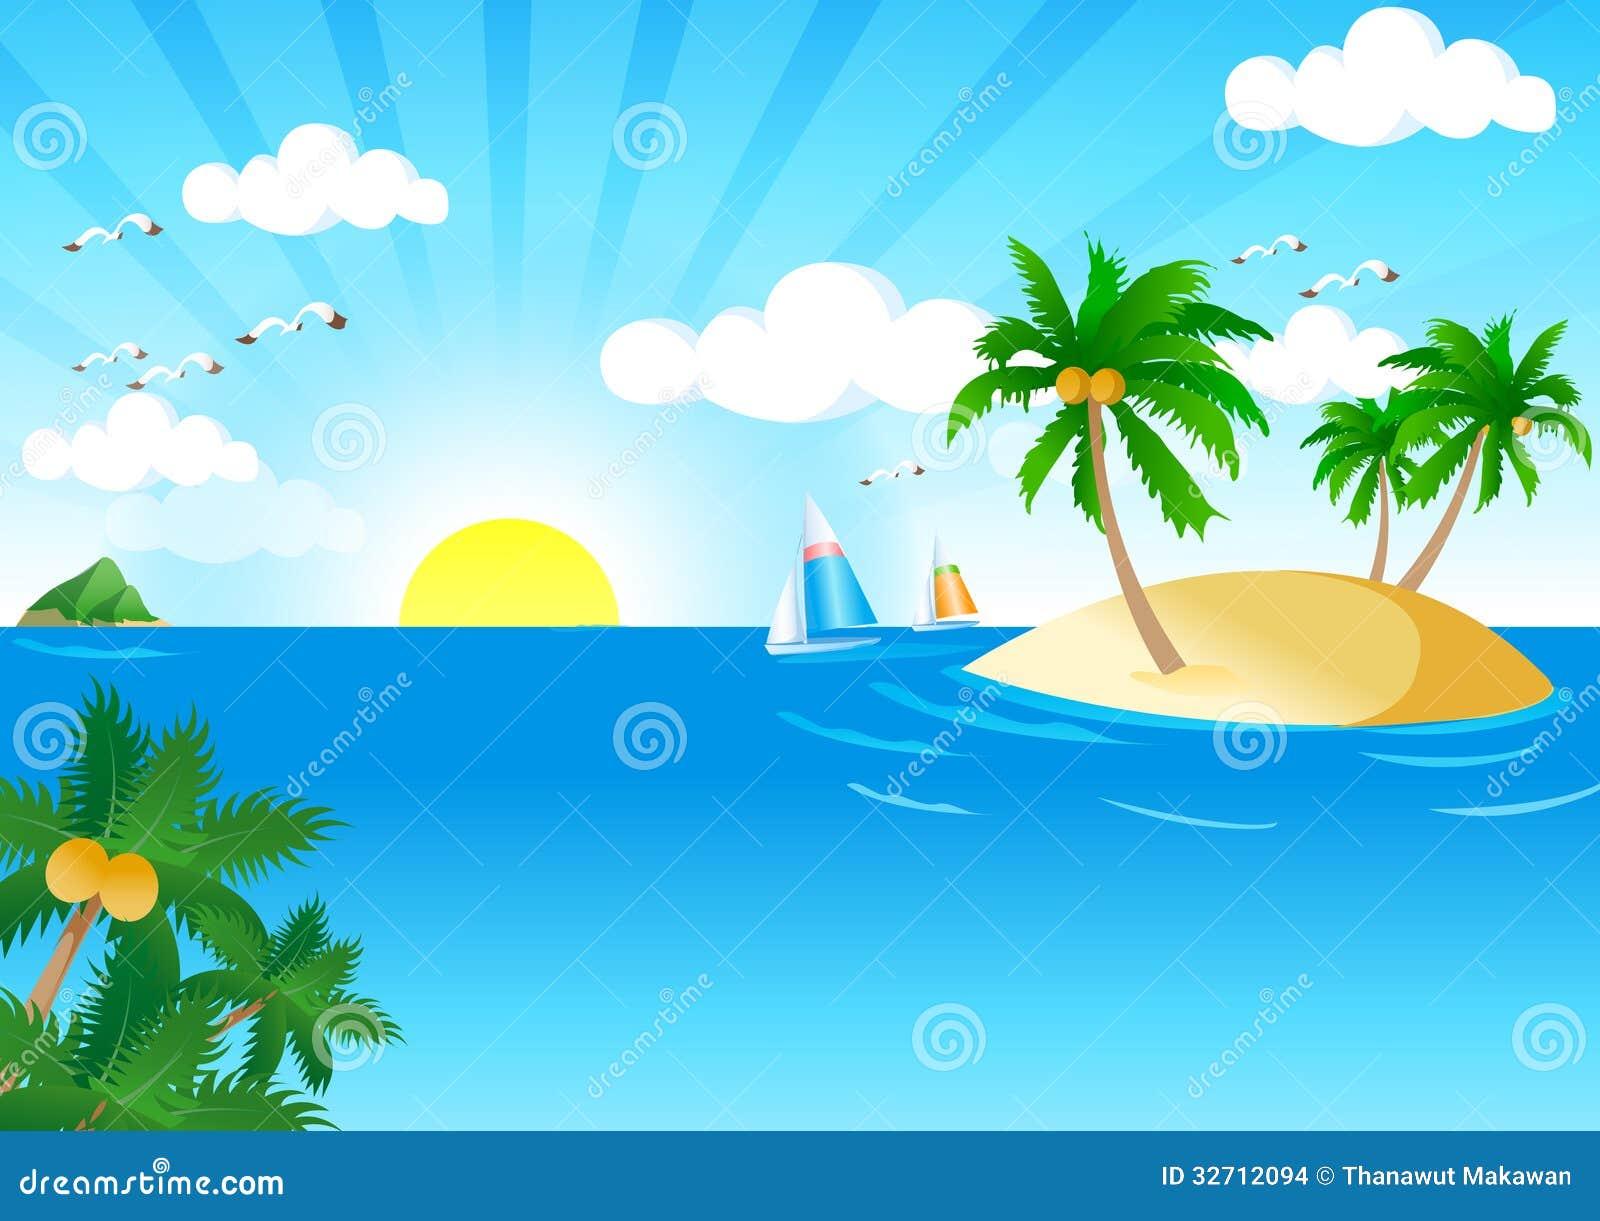 summer wallpaper swimming vector - photo #2